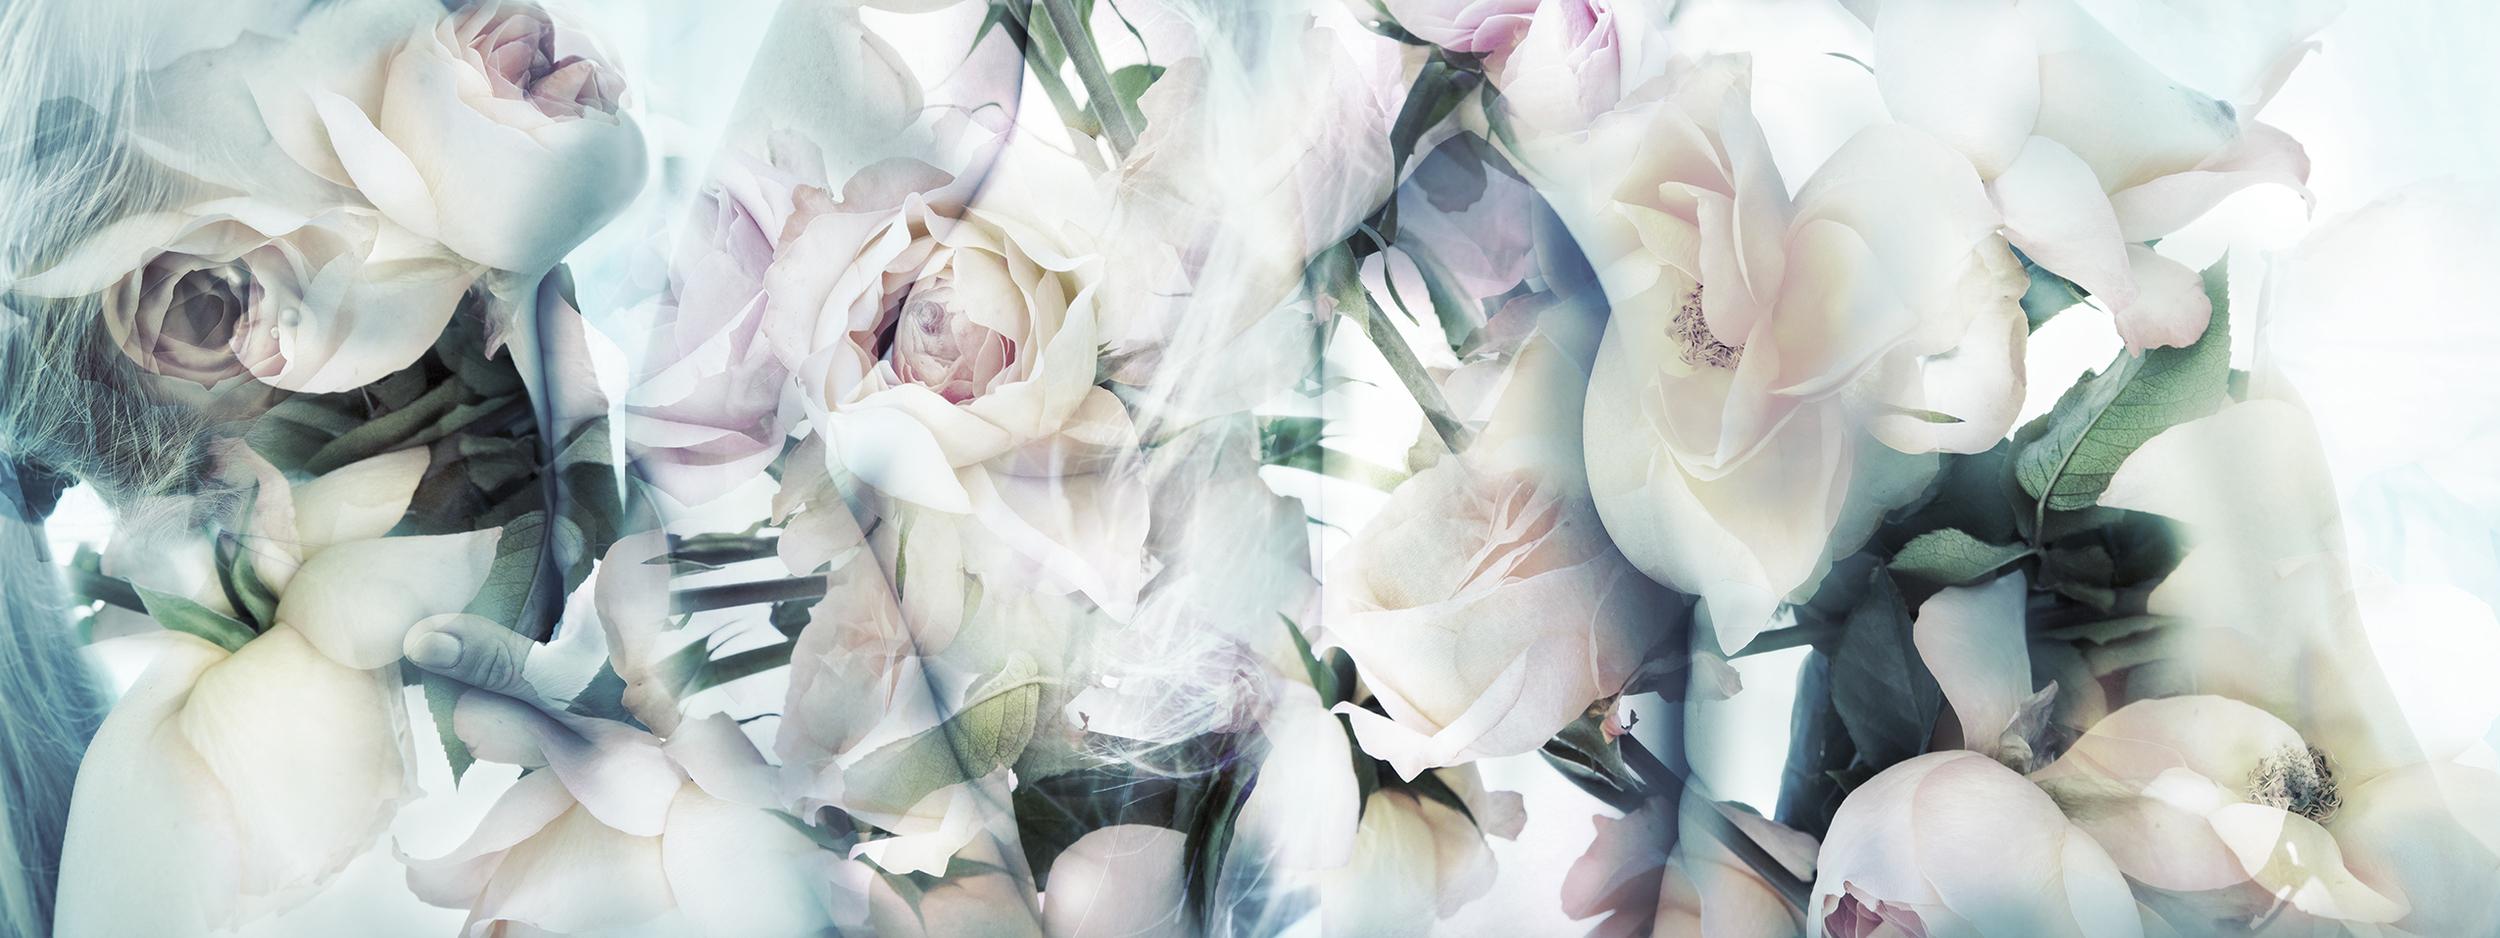 Angi_Bodyparts_Collage.jpg